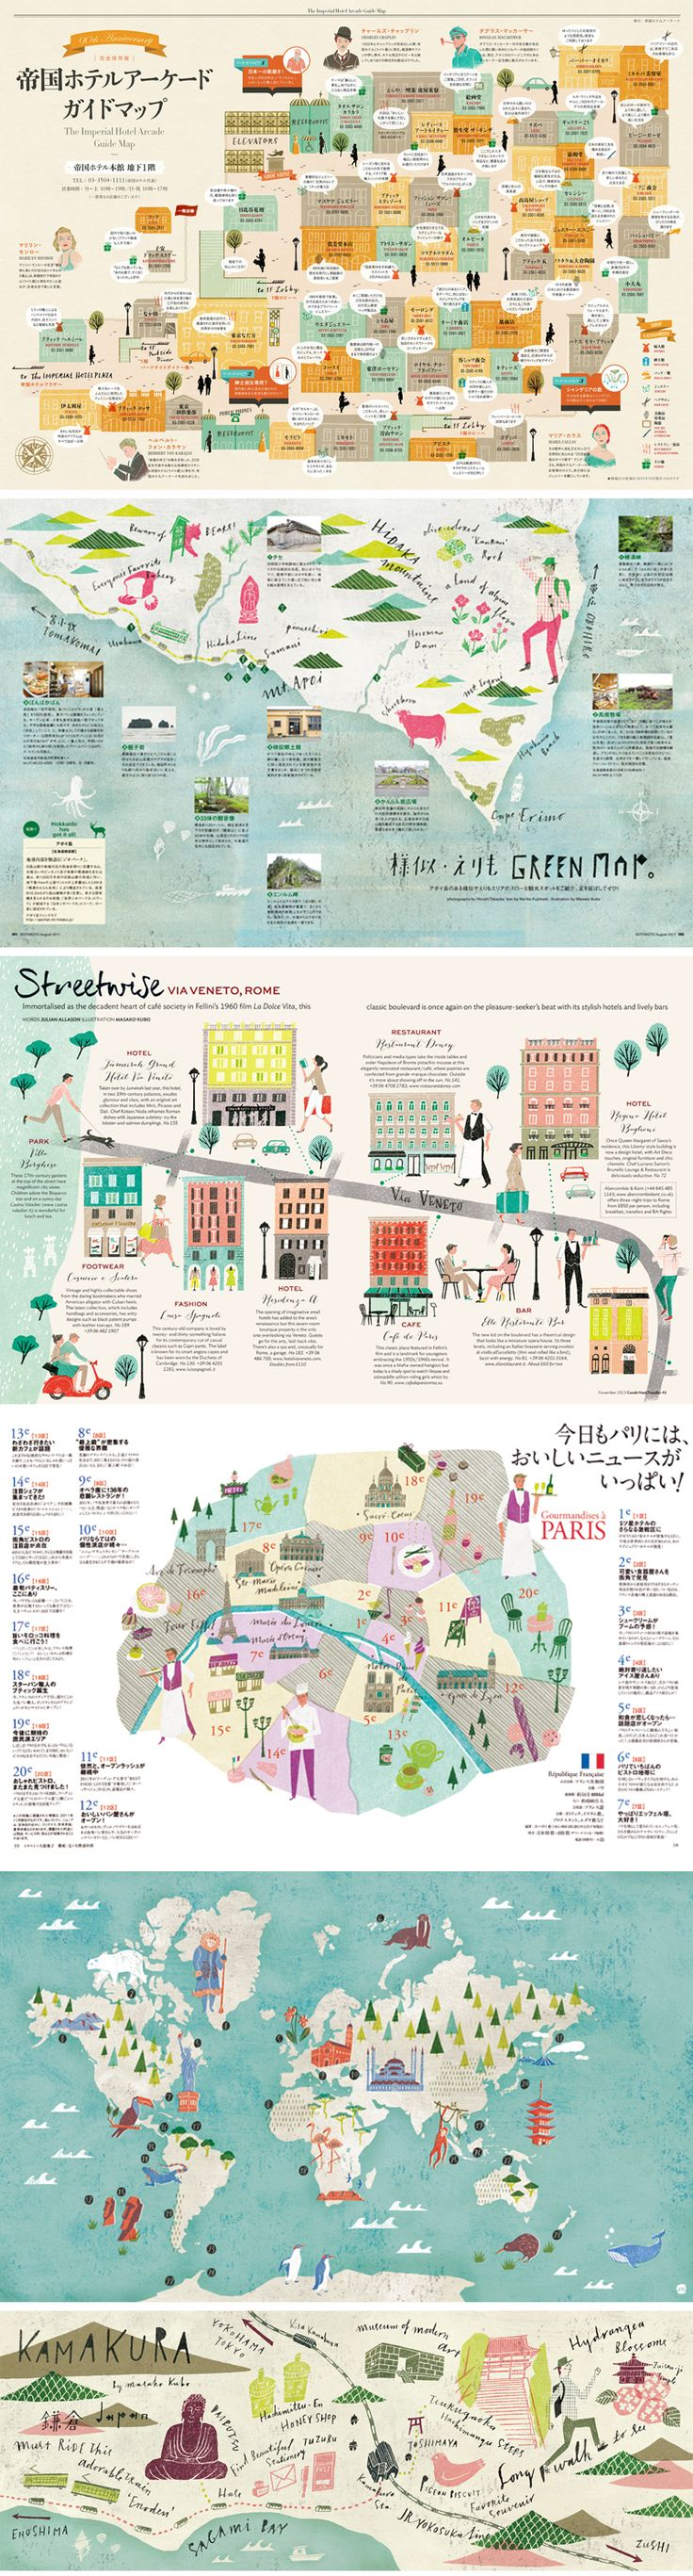 Mapa ilustrado, ¡me encantan! | Masako Kubo